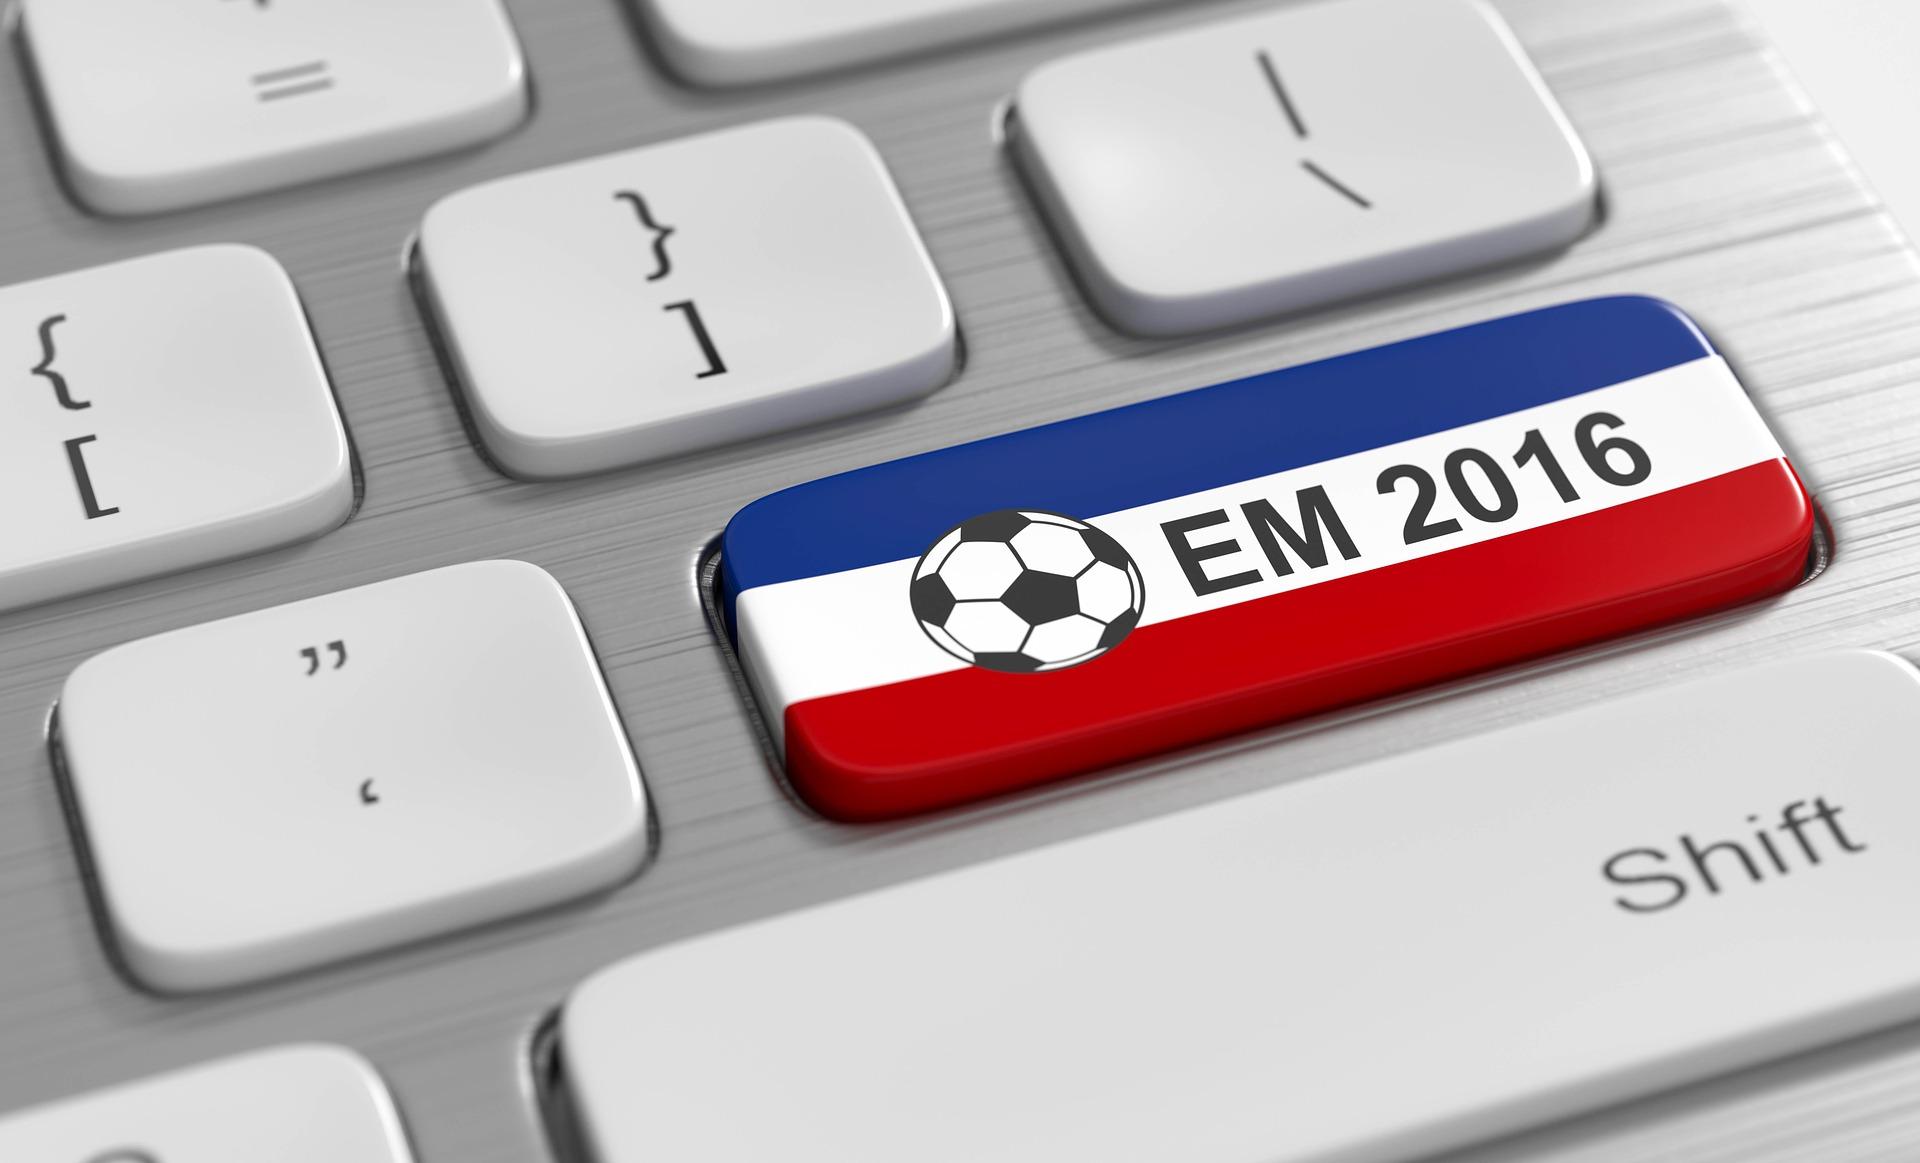 LINET Services kürt Sieger des Tippspiels zur Fußball-EM